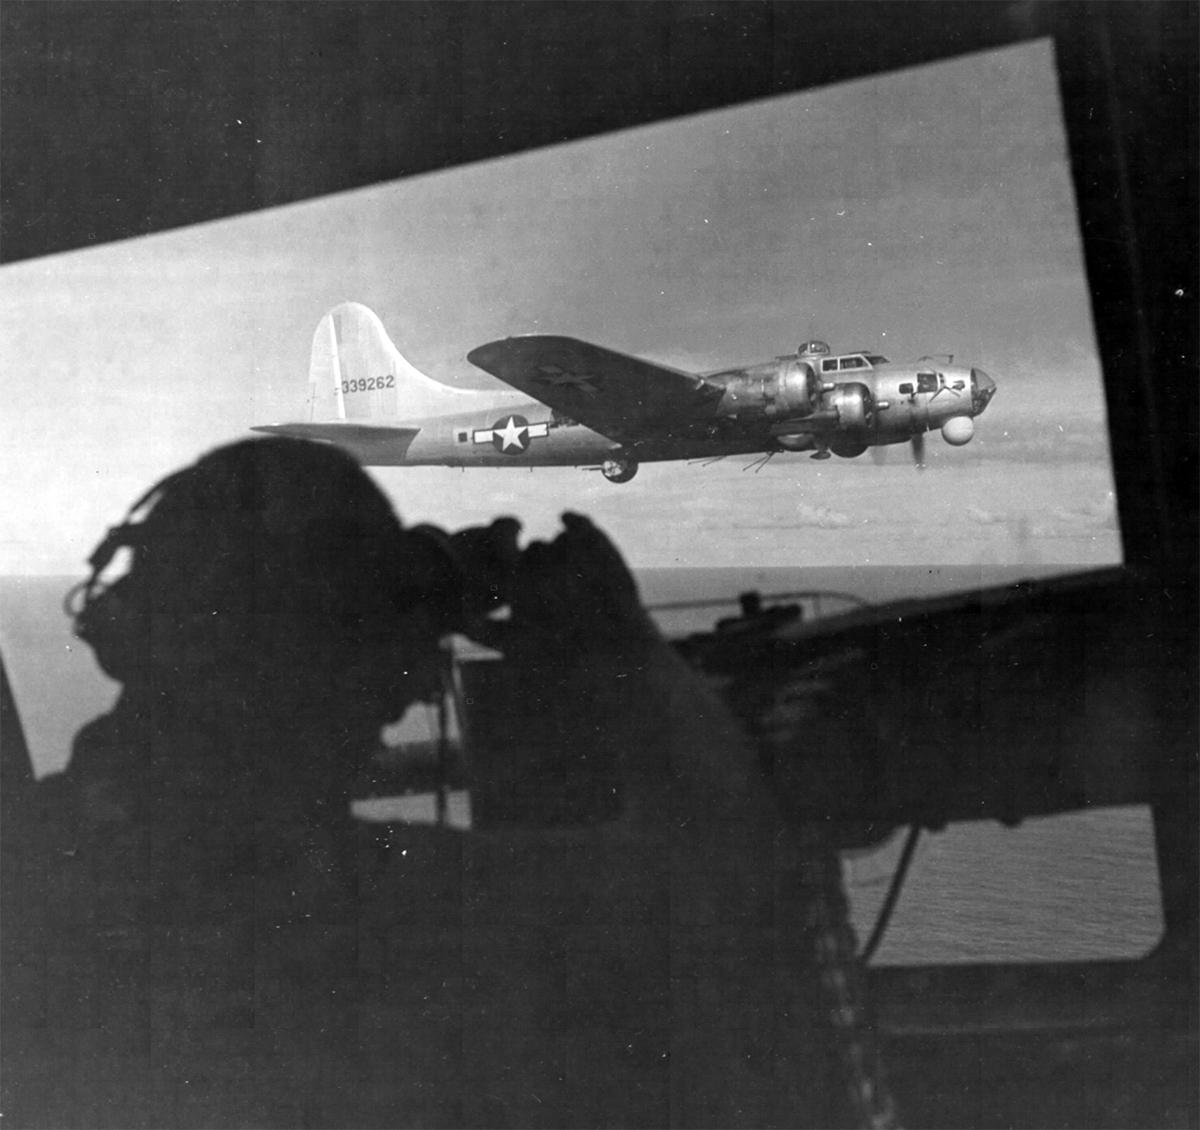 B-17 #43-39262